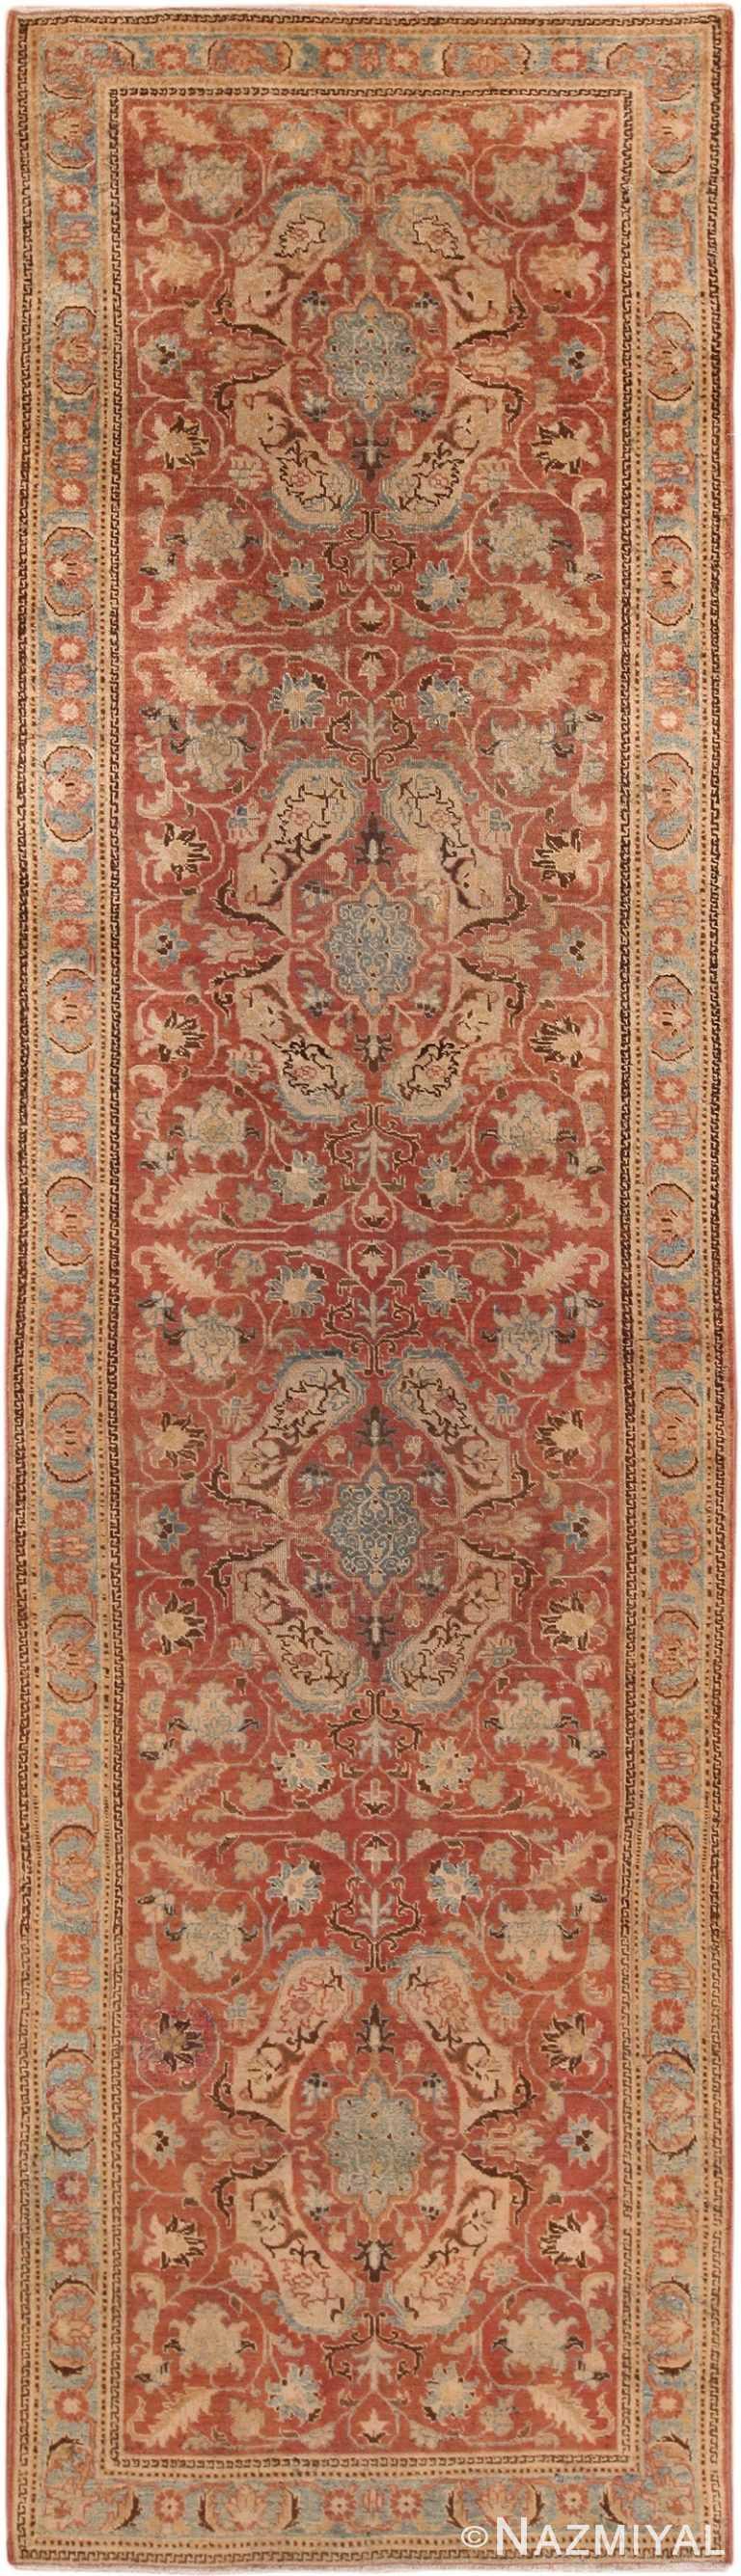 Antique Persian Tabriz Runner Rug 70287 by Nazmiyal NYC